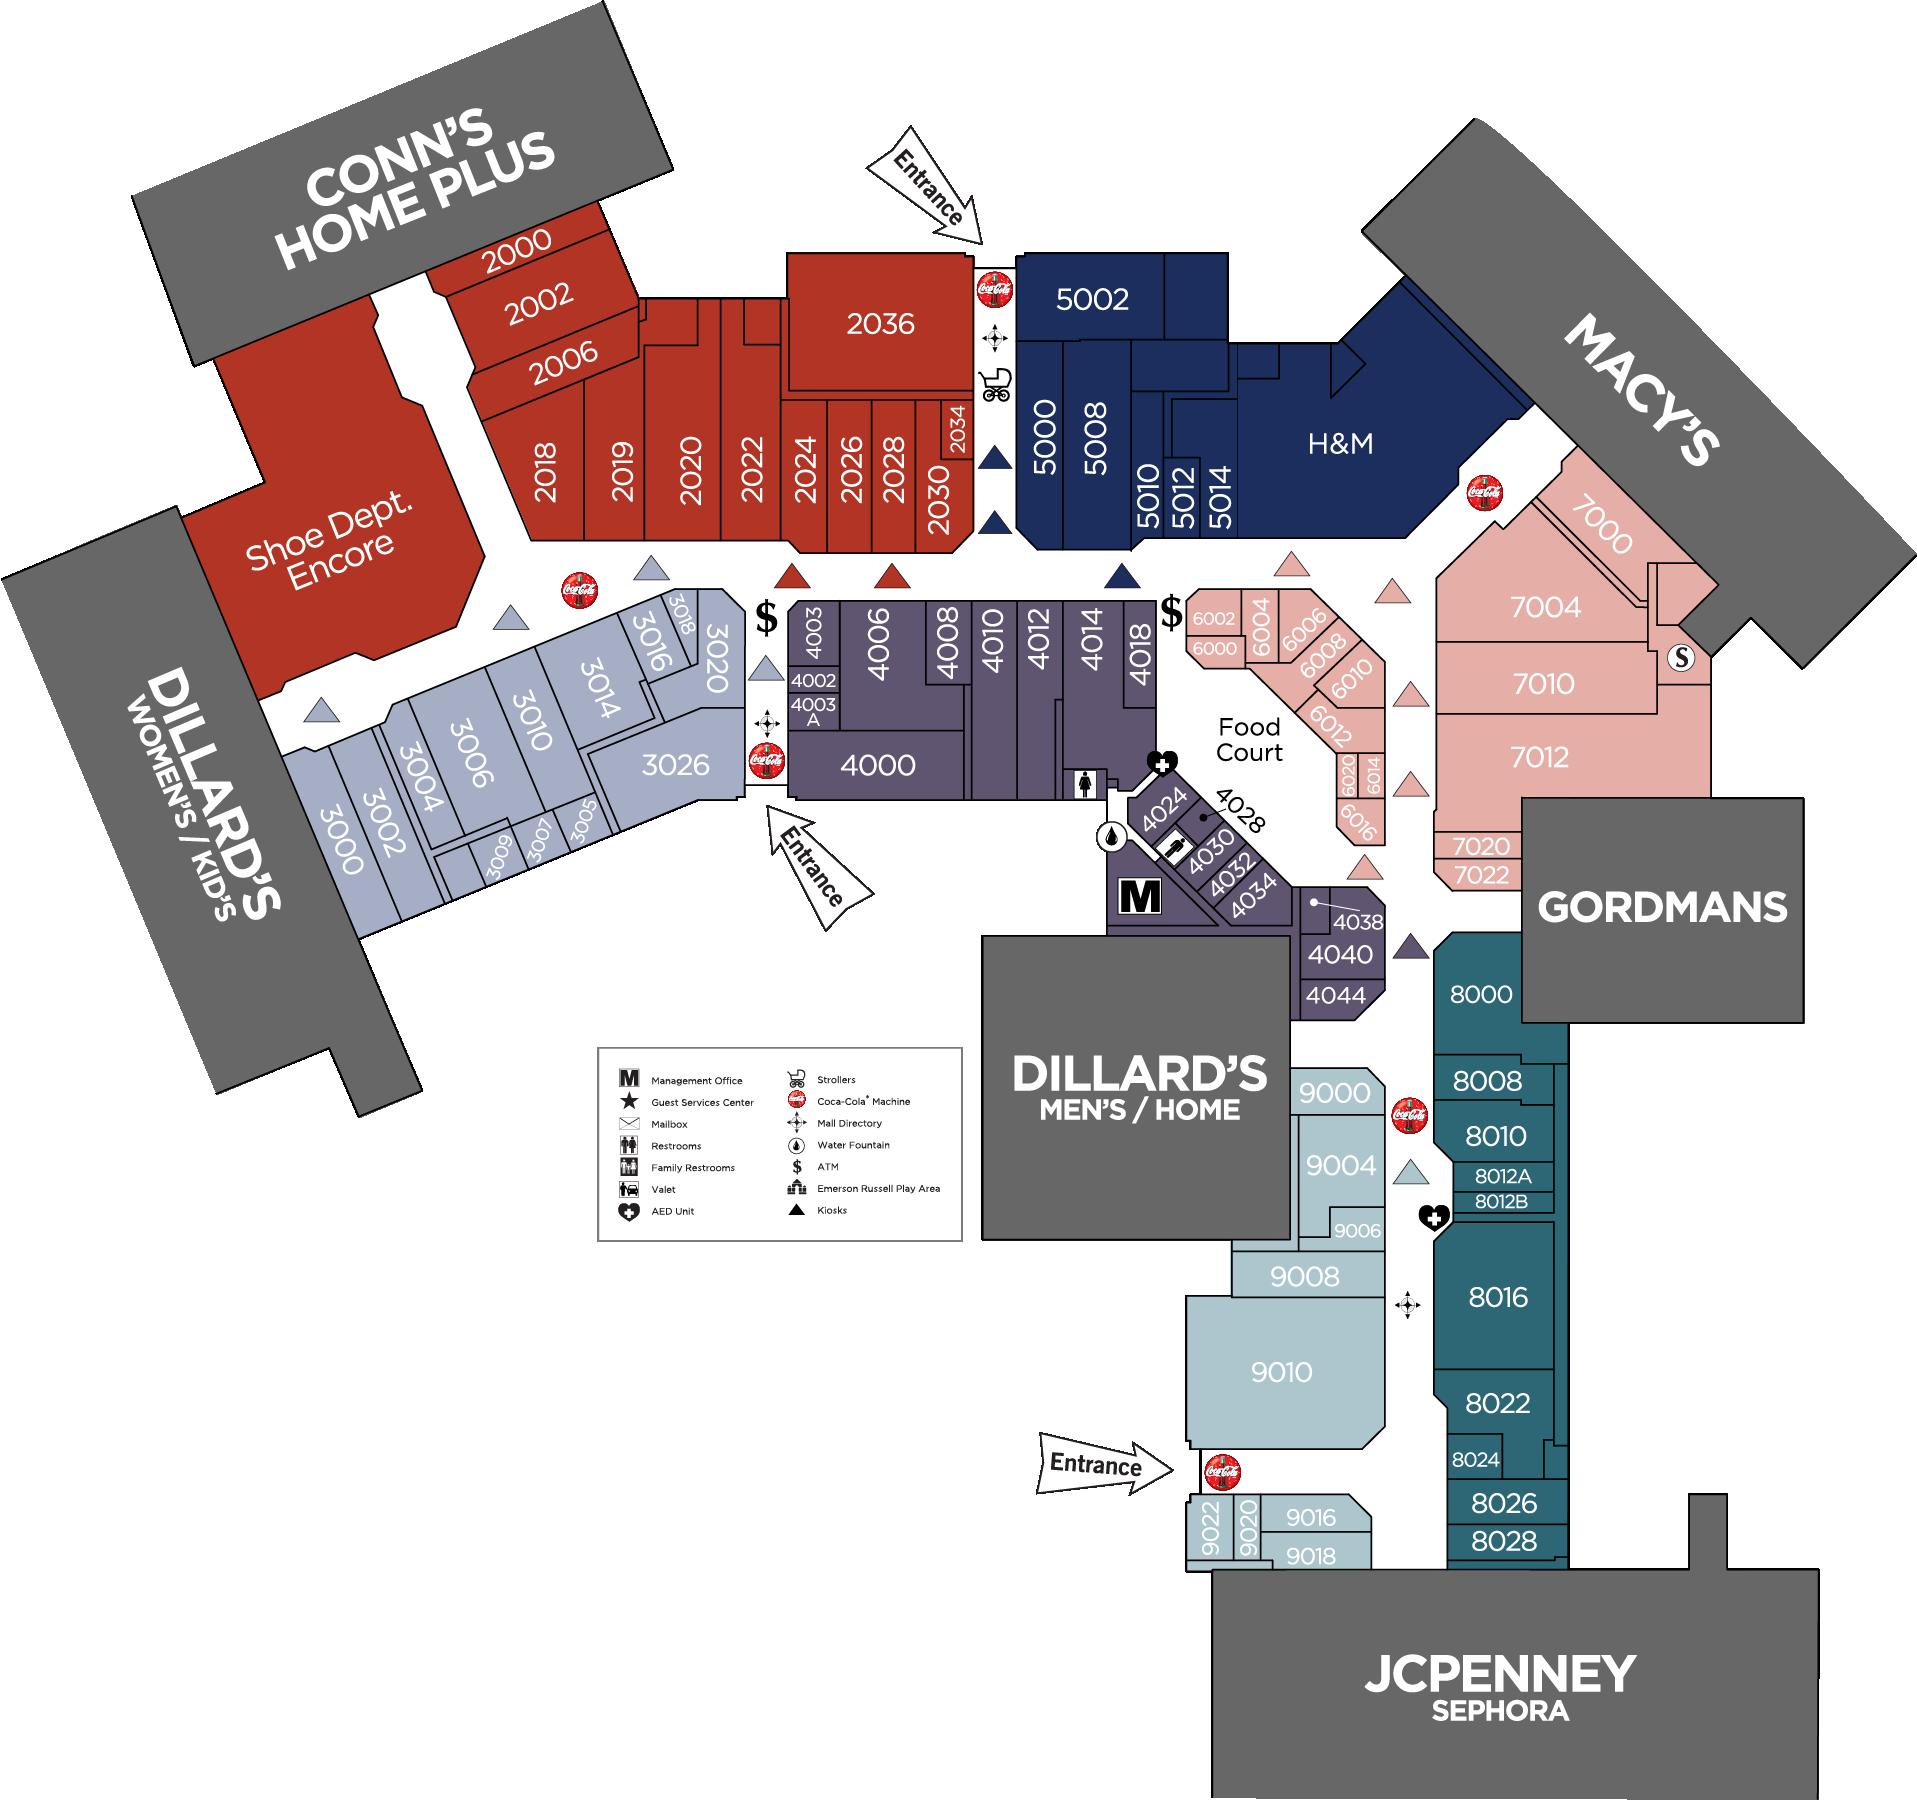 Mall Directory